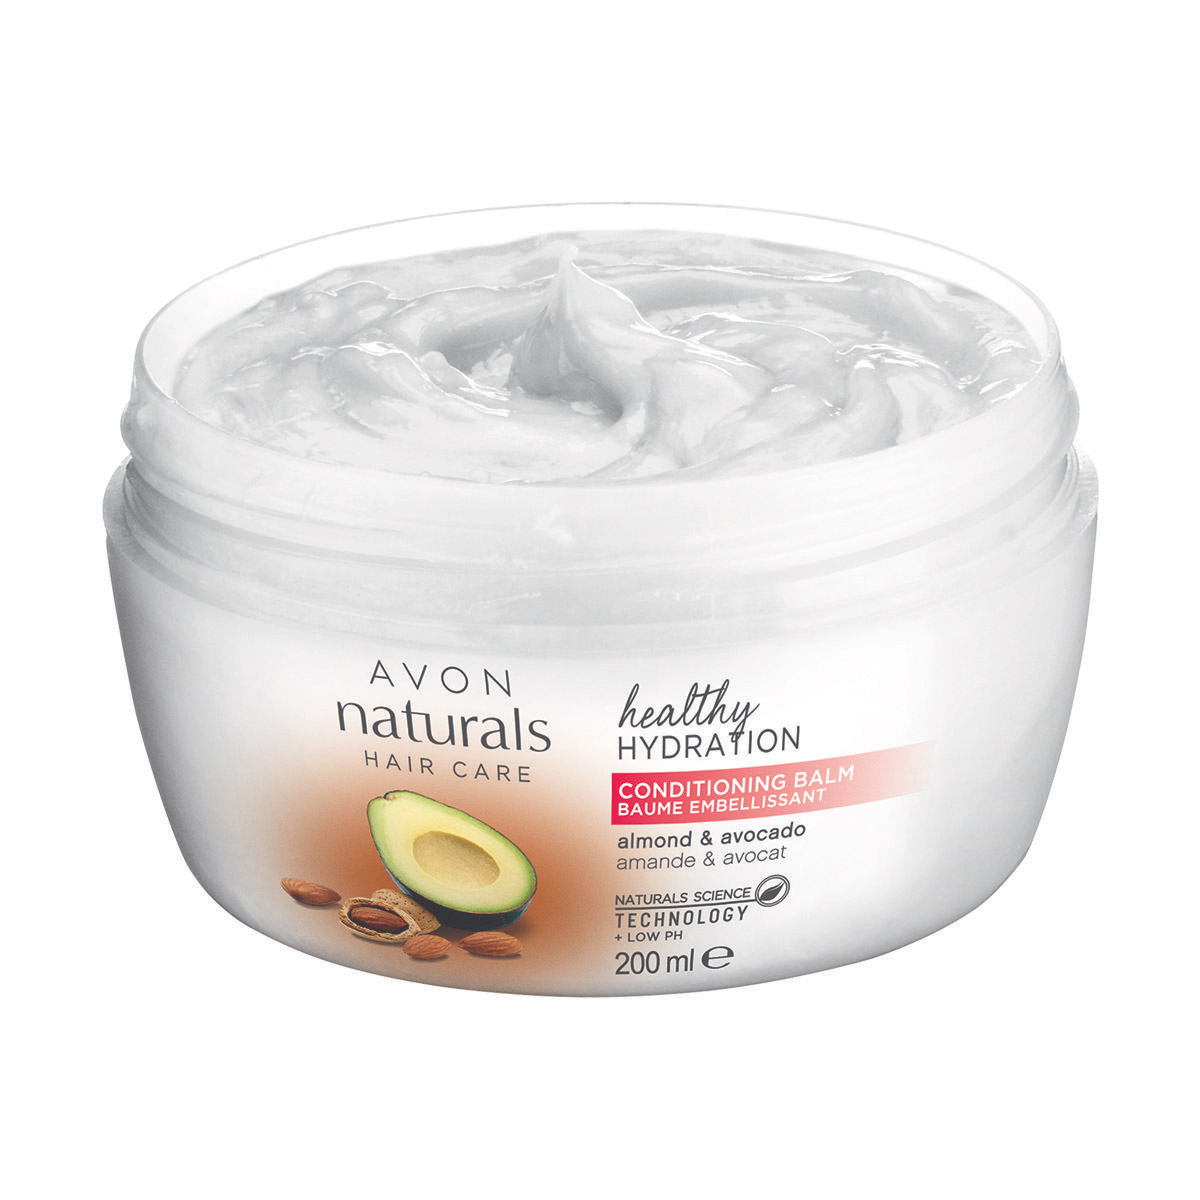 Naturals Conditioning Balm Almond & Avocado 53051 200ml